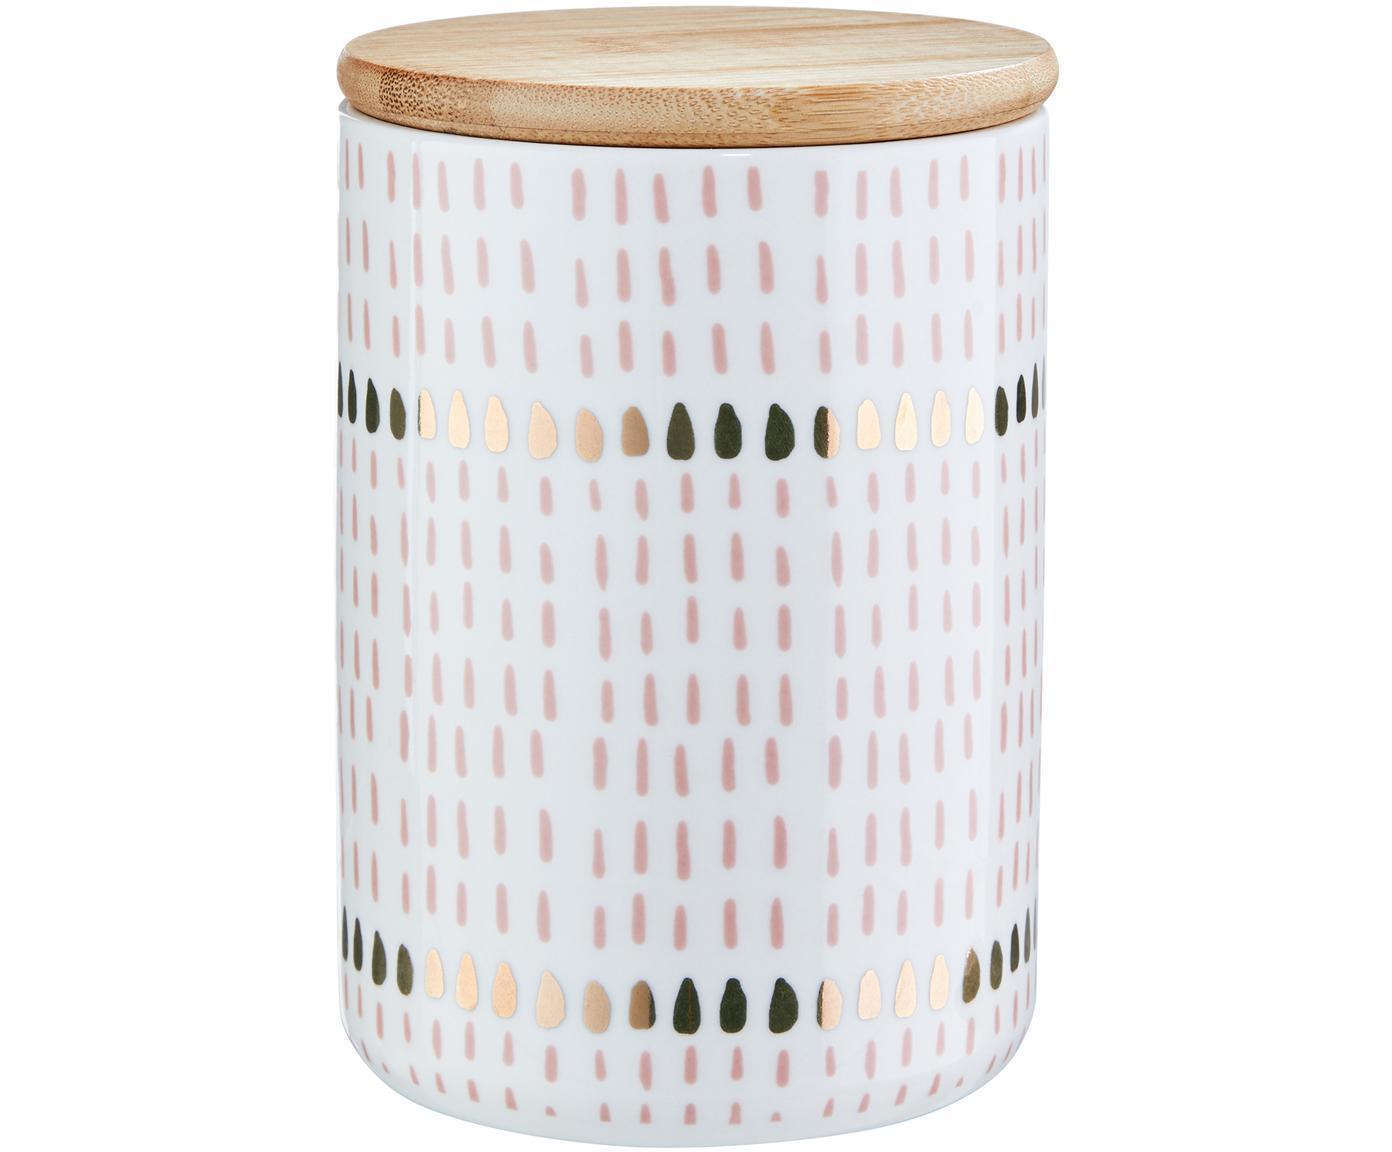 Aufbewahrungsdose Drops, Dose: Dolomit, Deckel: Bambus, Silikon, Rosa, Ø 10 x H 14 cm